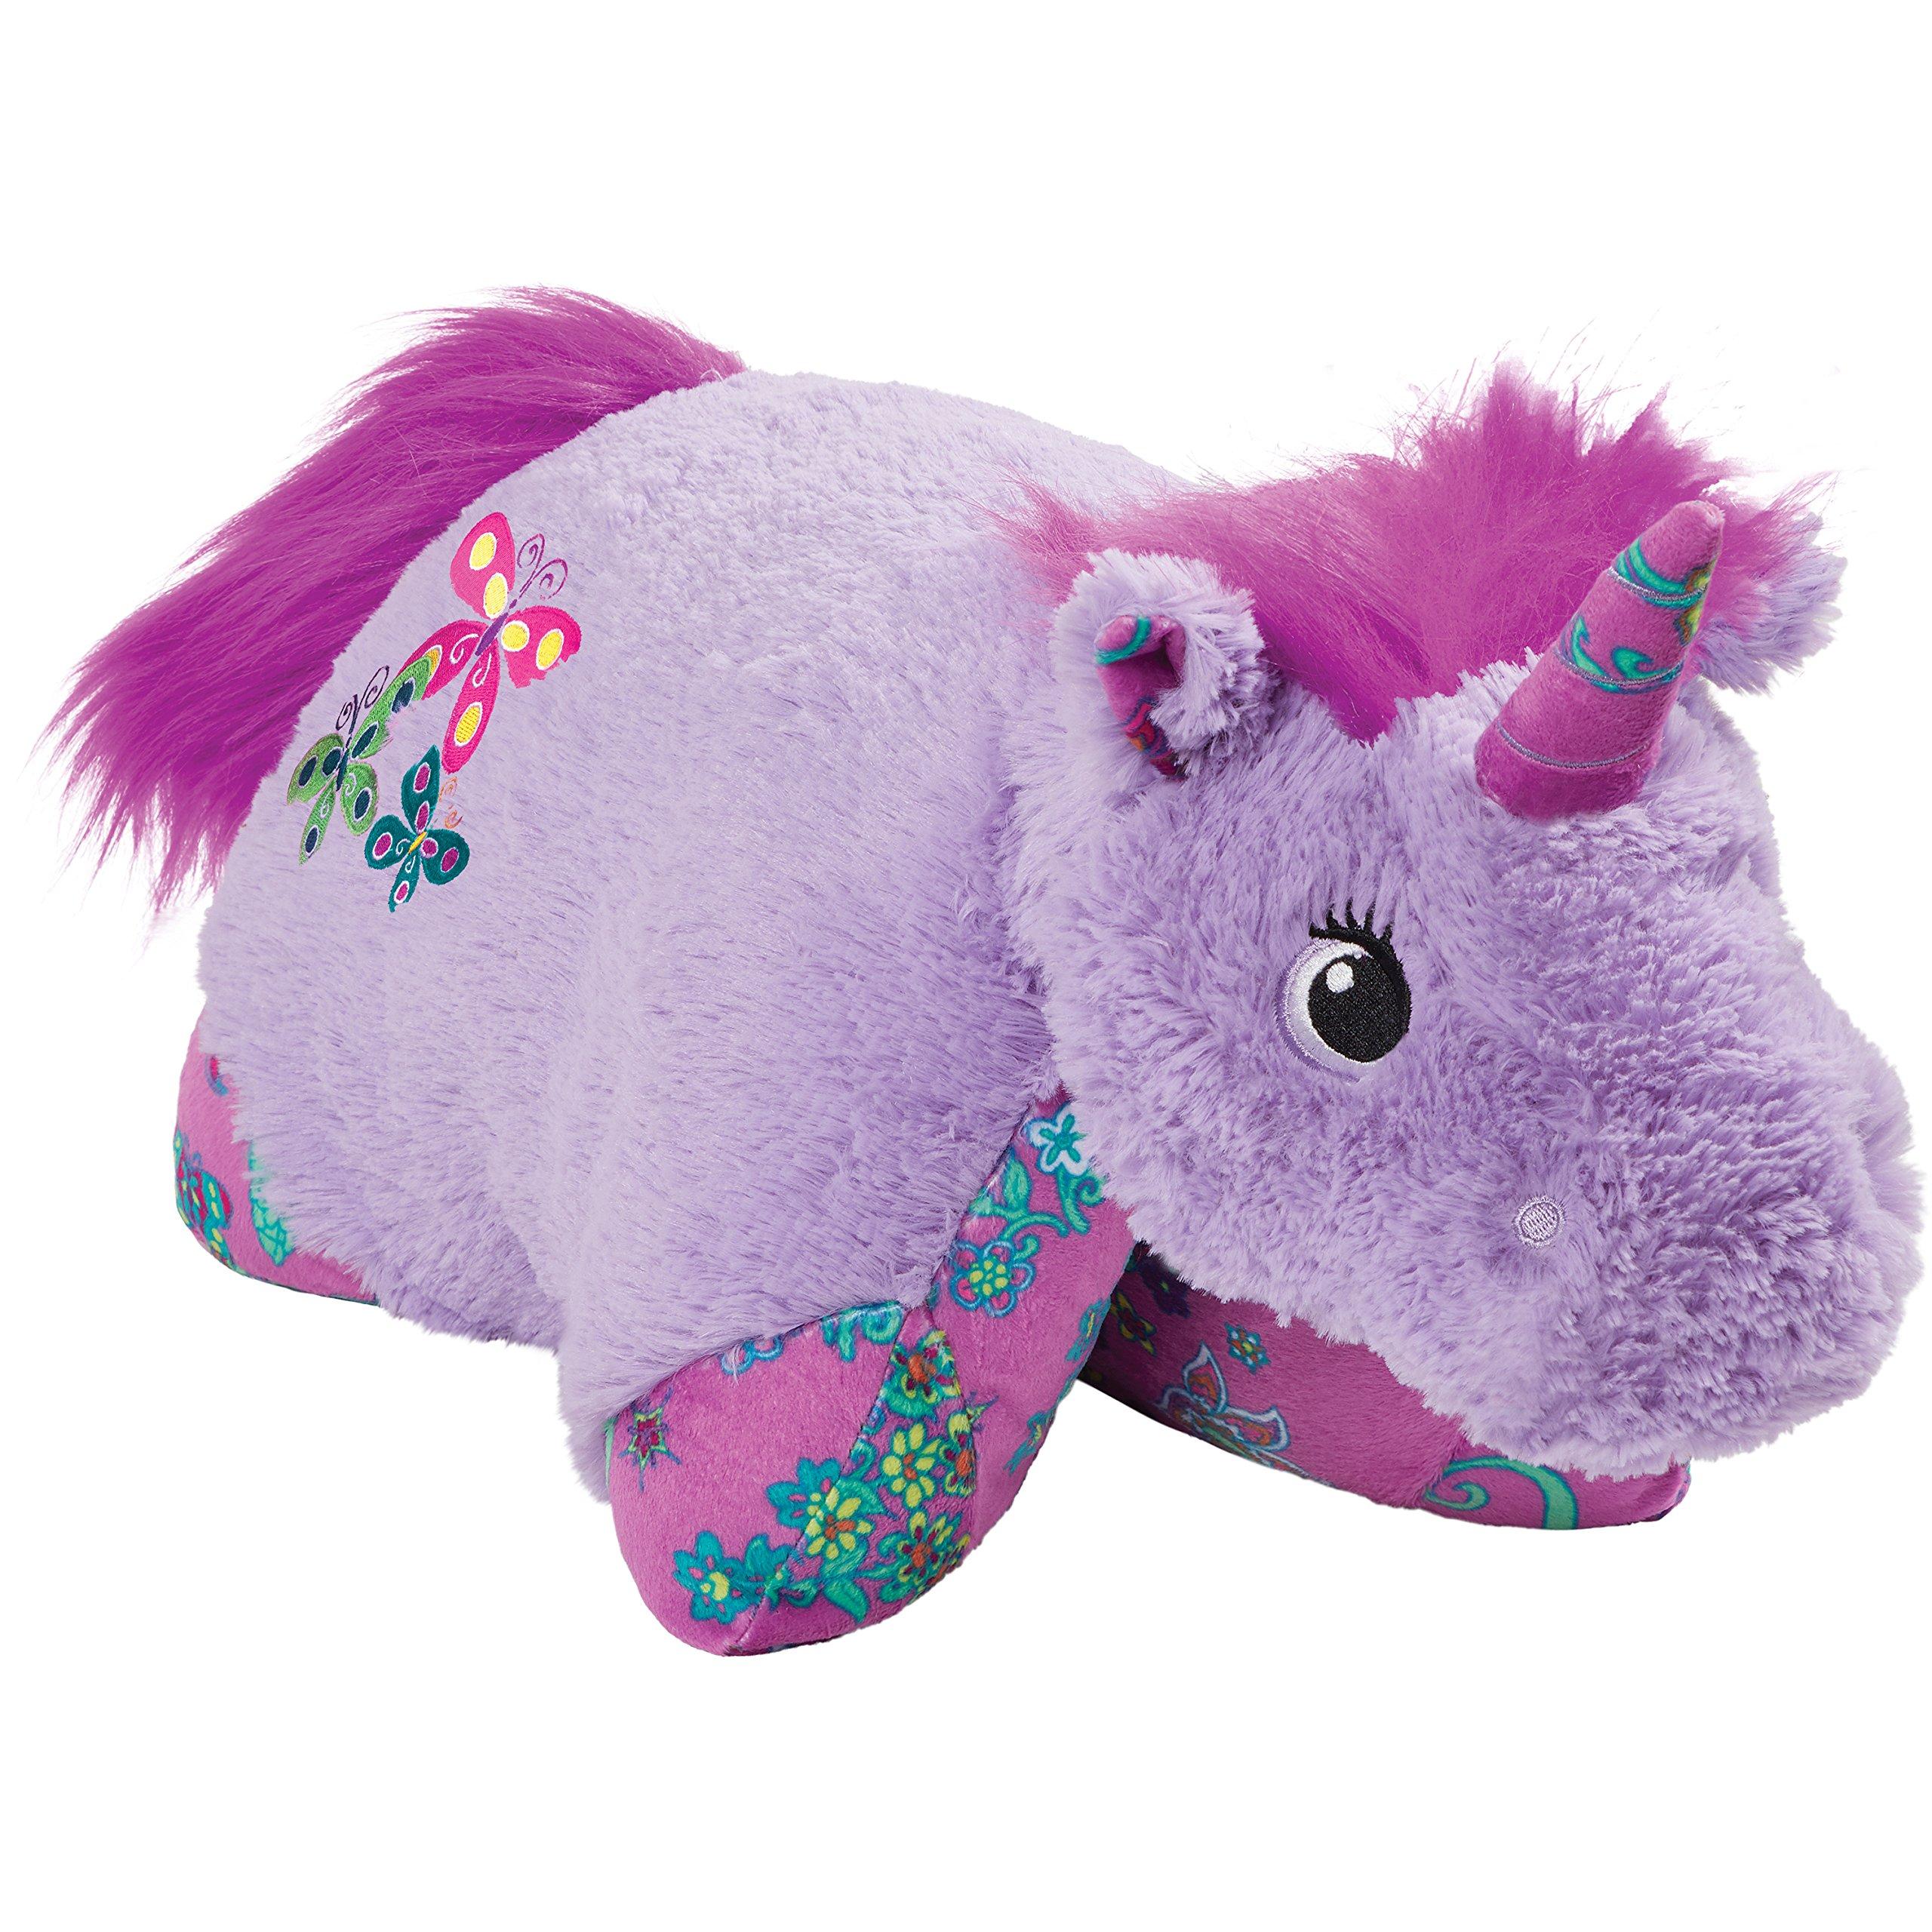 Pillow Pets Colorful Lavender Unicorn, 18'' Stuffed Animal Plush Toy by Pillow Pets